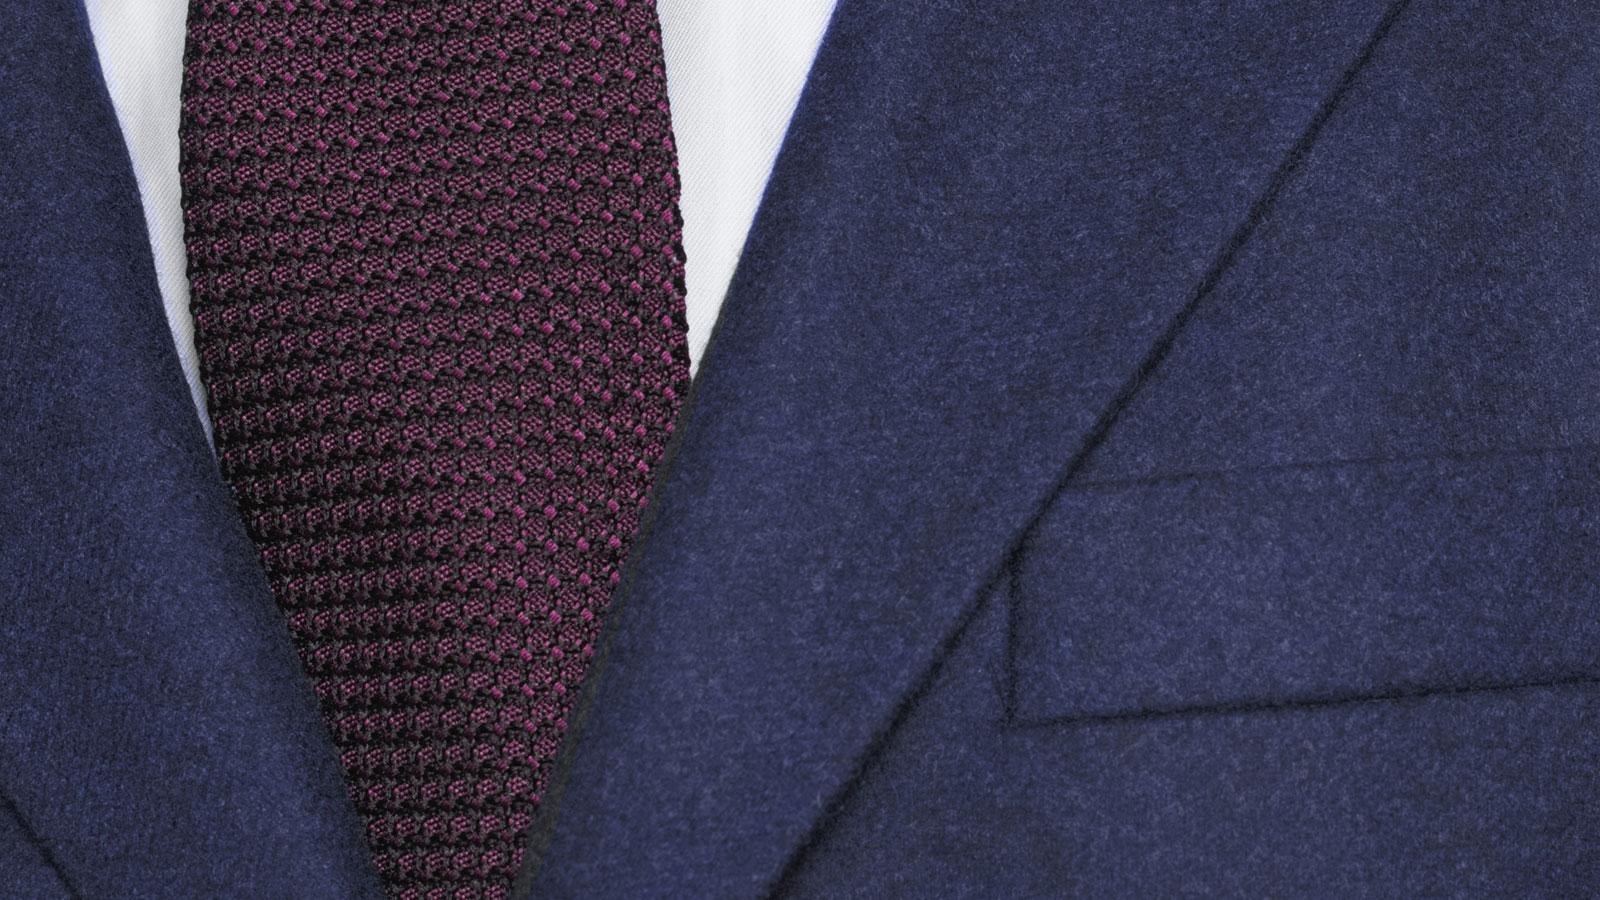 Coat in Solid Navy Wool - slider image 1